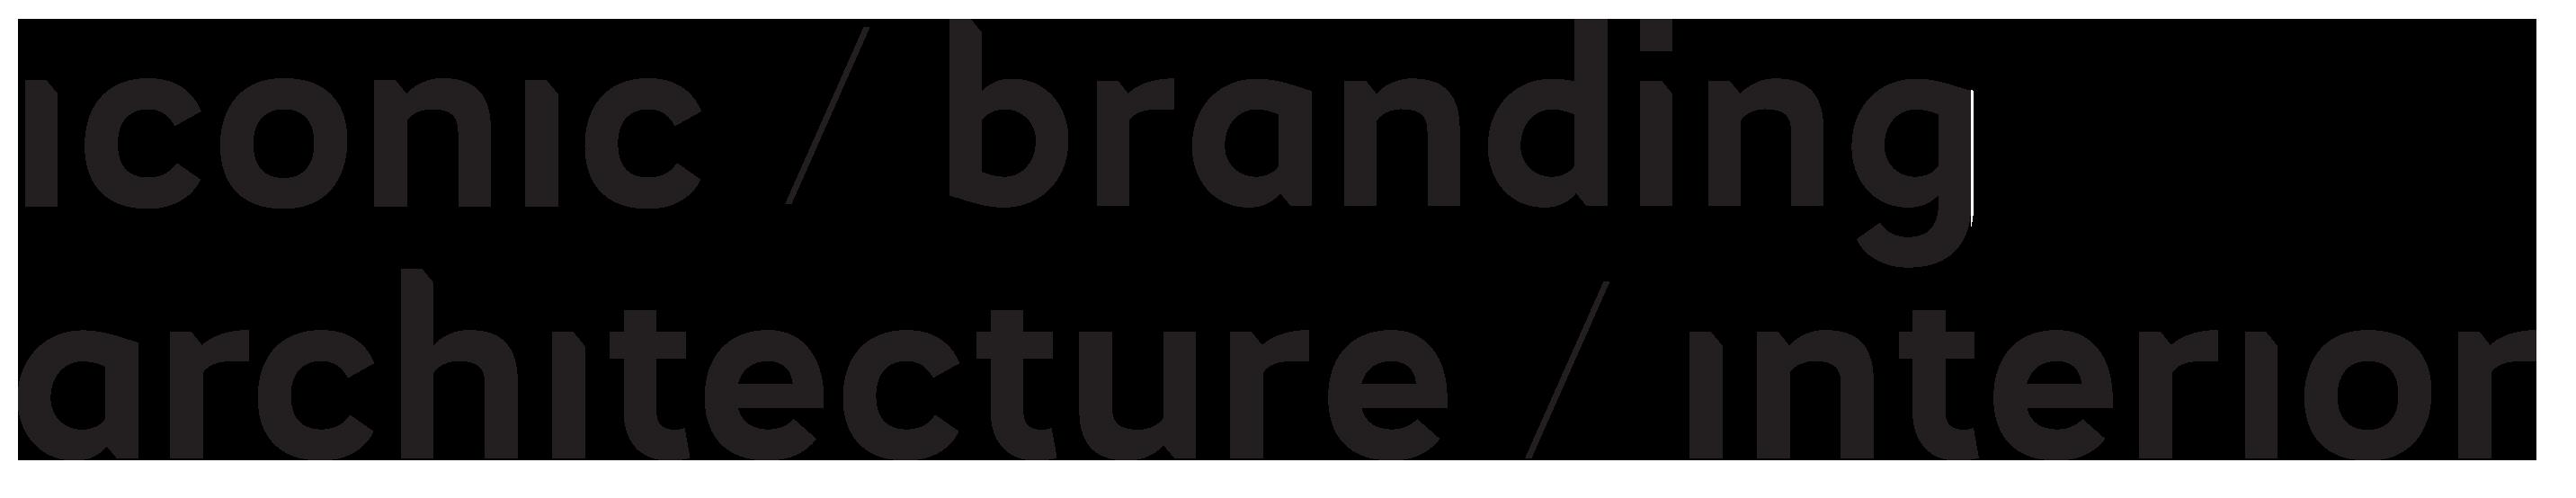 IconicDesign Logo